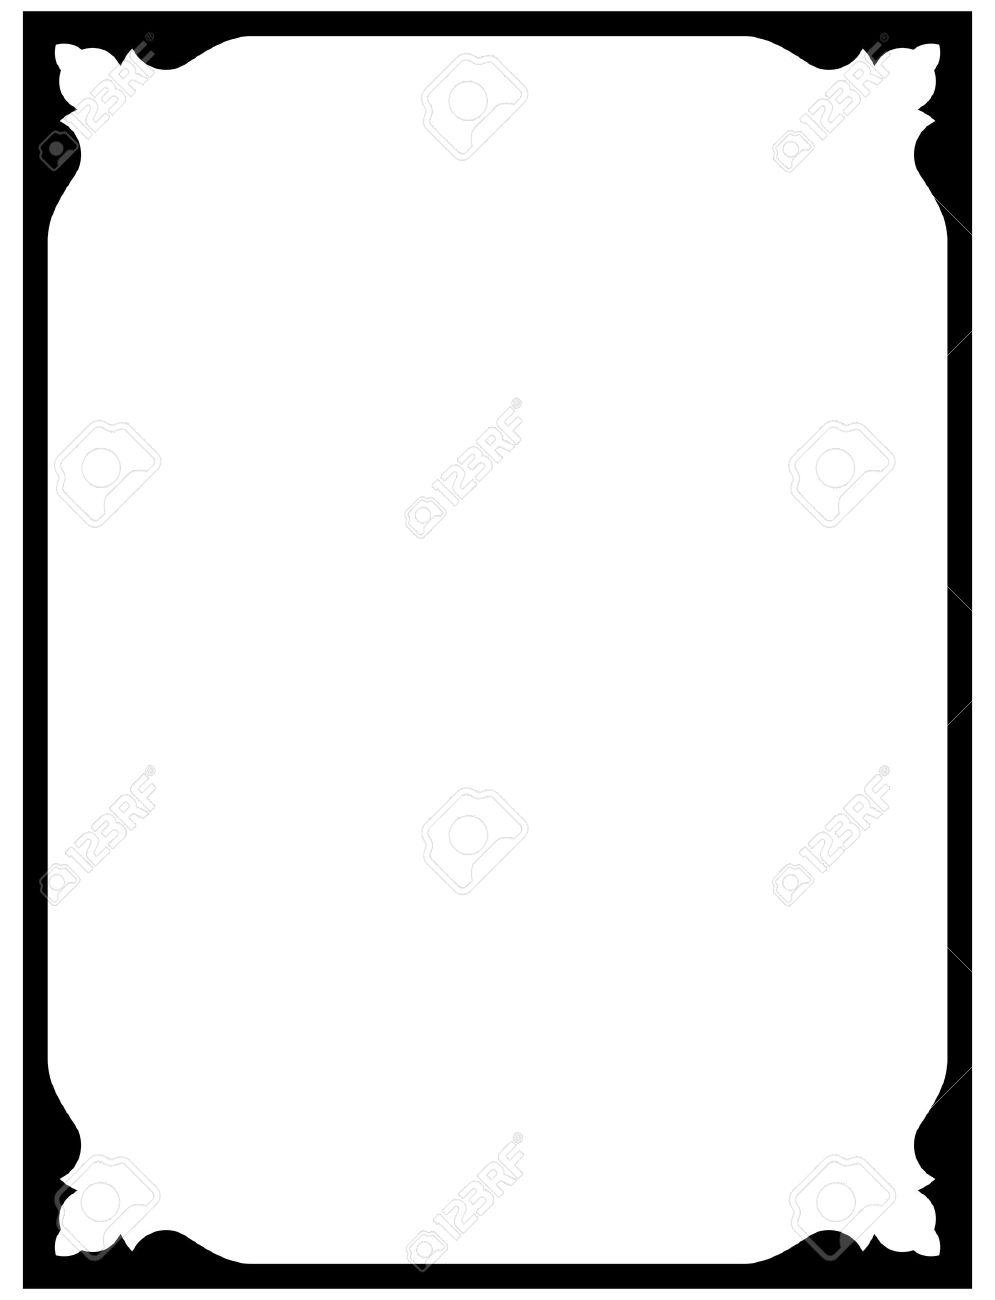 995x1300 Simple Border Frames Clip Art